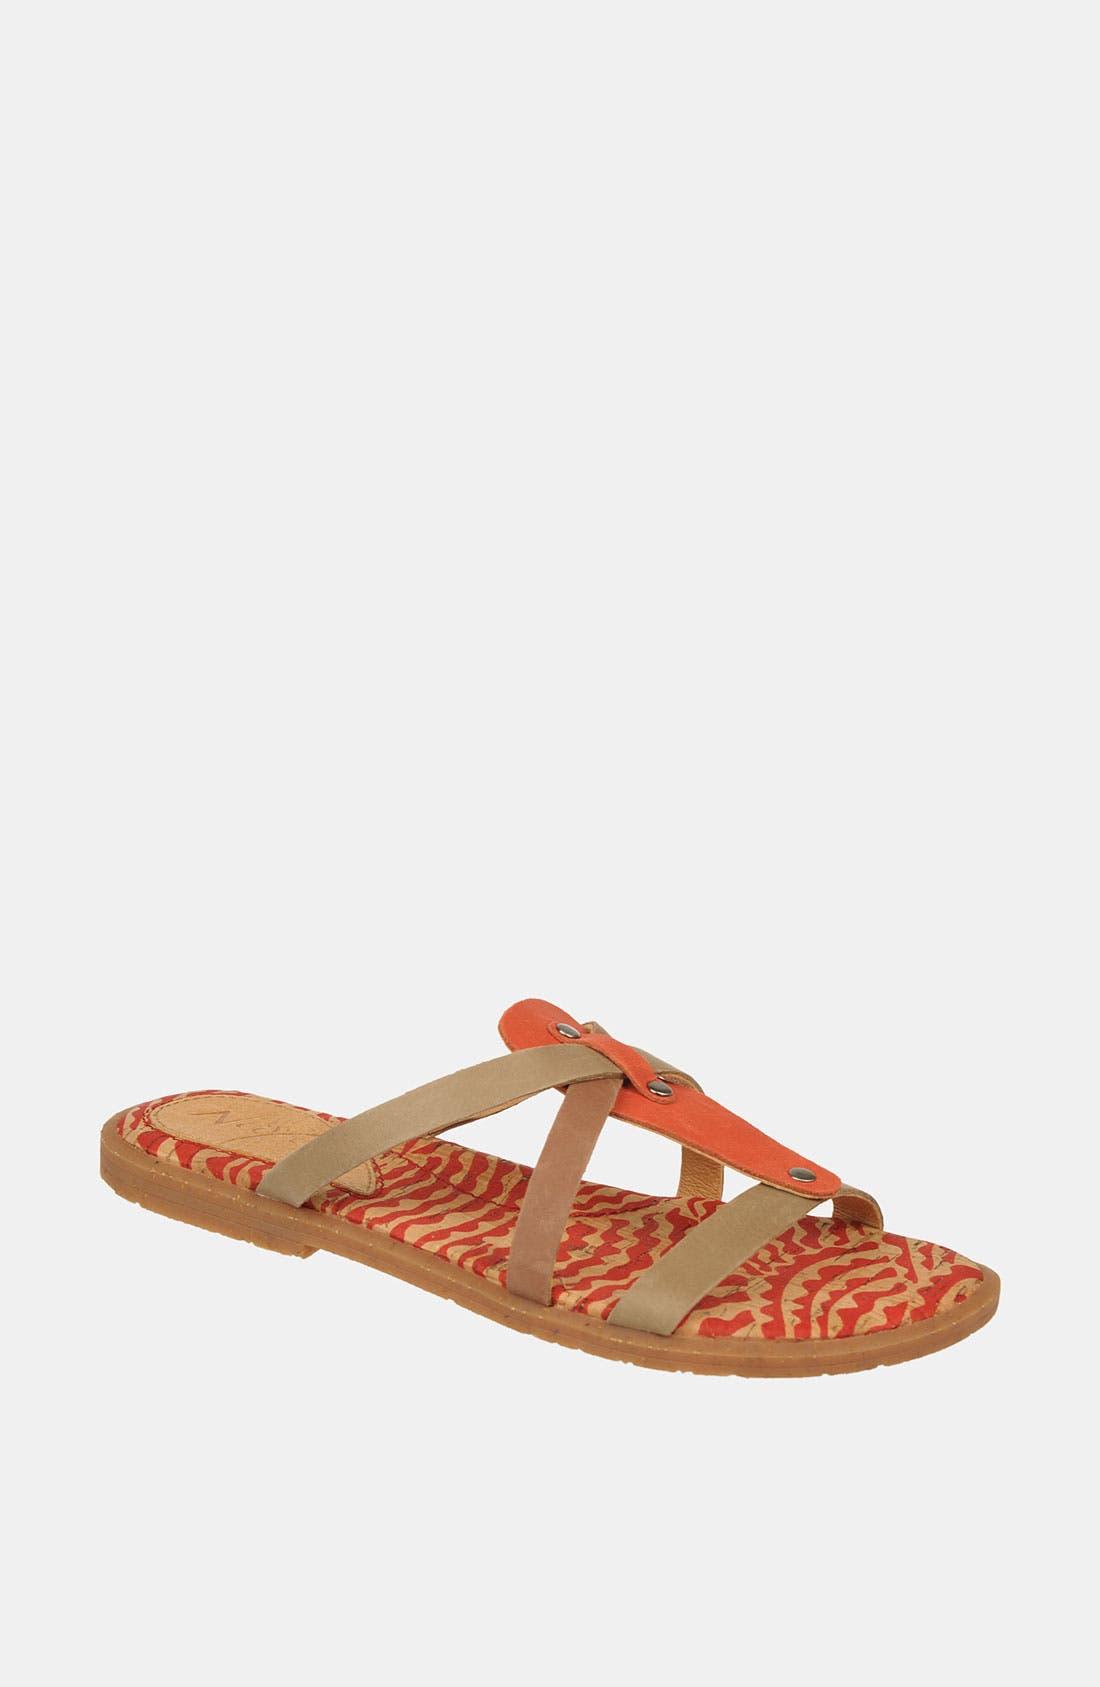 Main Image - Naya 'Painted Sock' Sandal